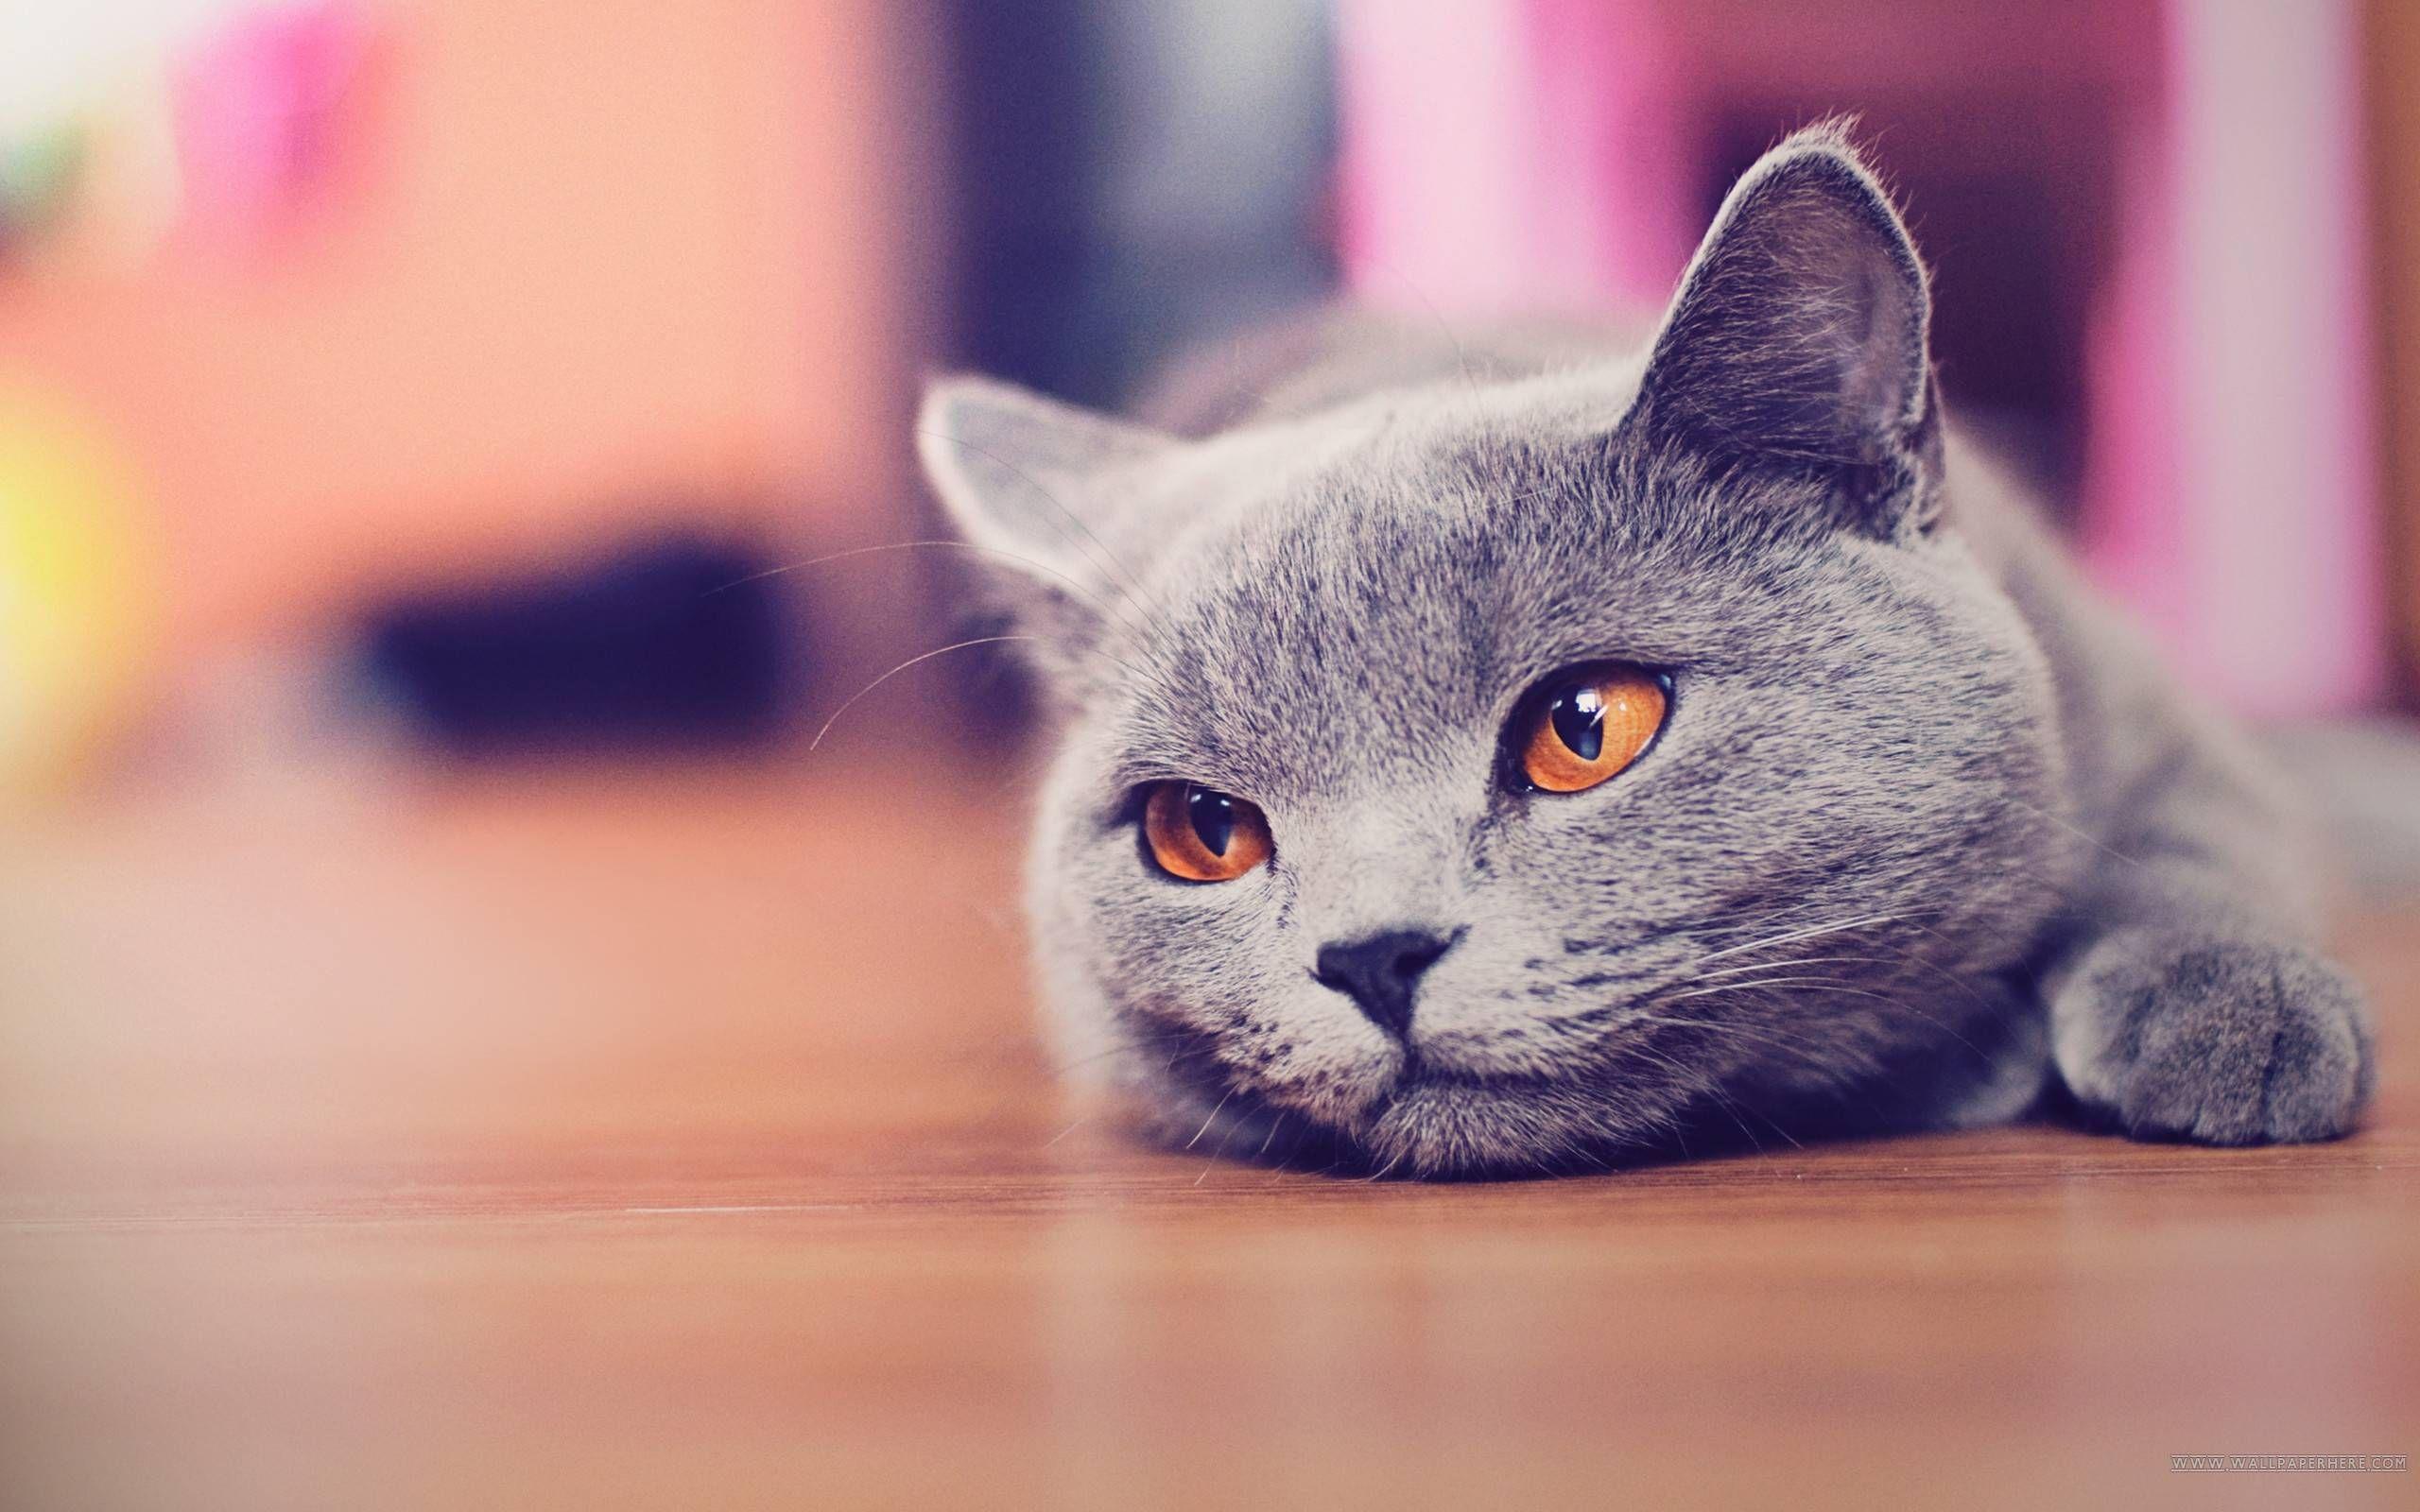 Pin Oleh Roxann Dawson Di Funny Cat Wallpaper Di 2020 Kucing Gambar Kucing Lucu Hewan